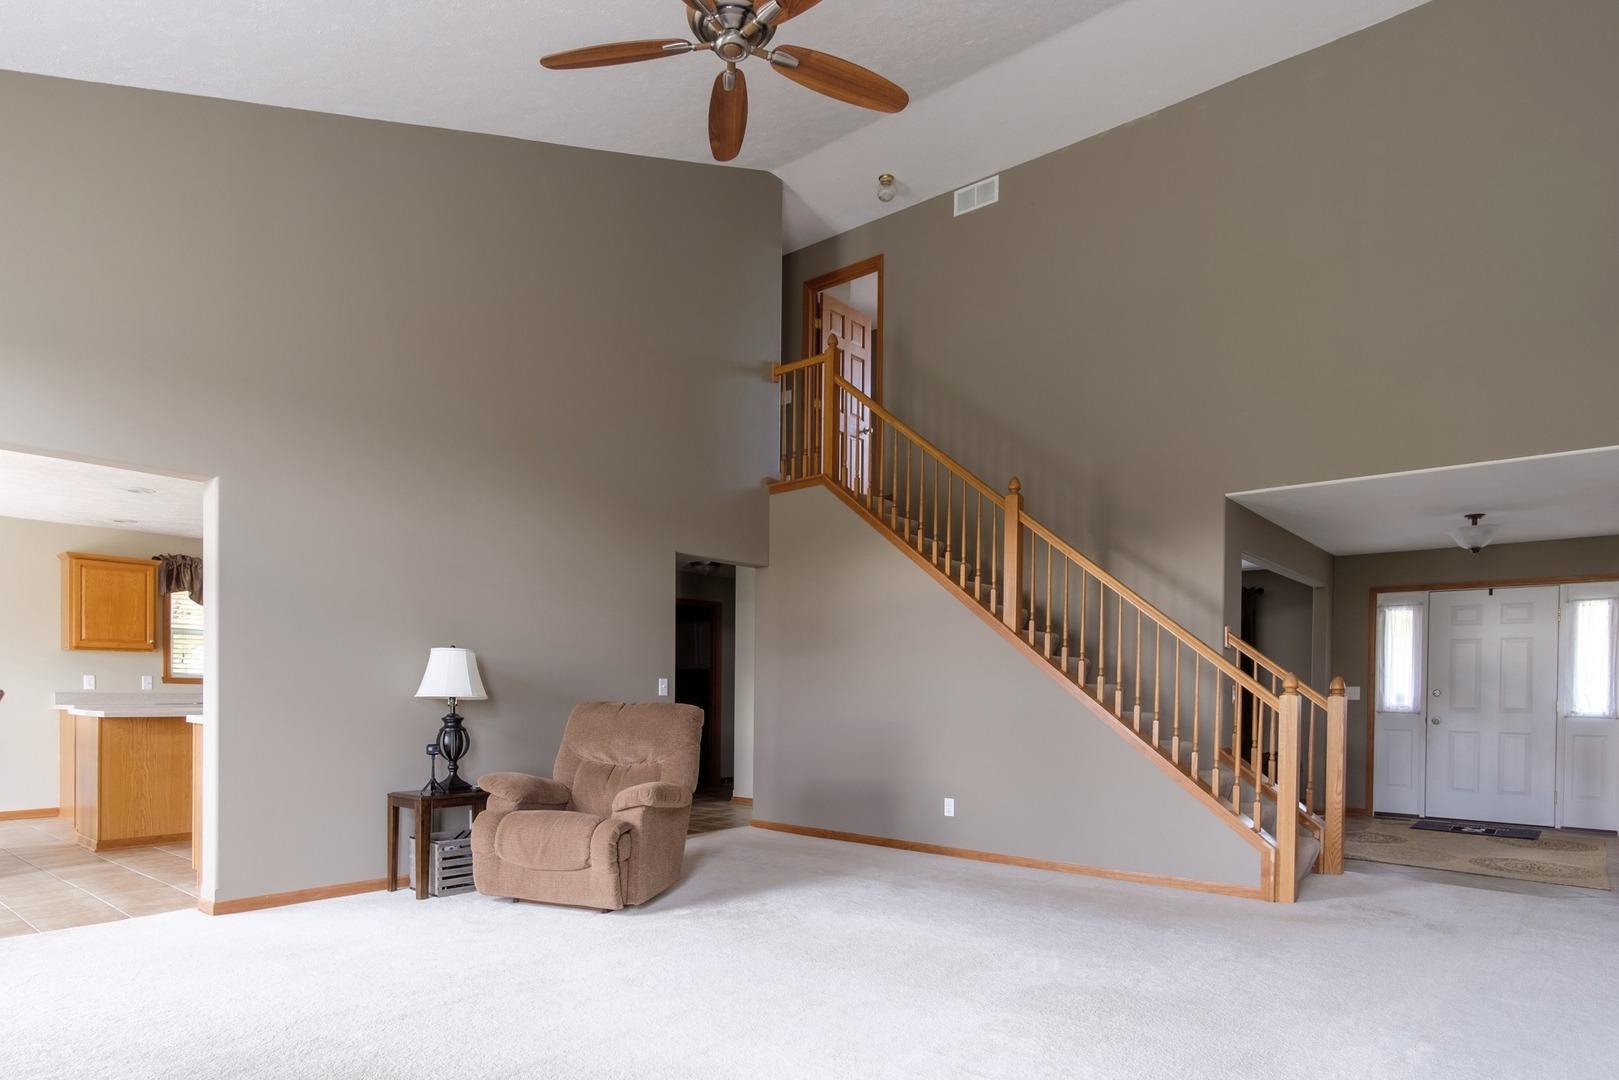 343 W Main, Poplar Grove, Illinois, 61065